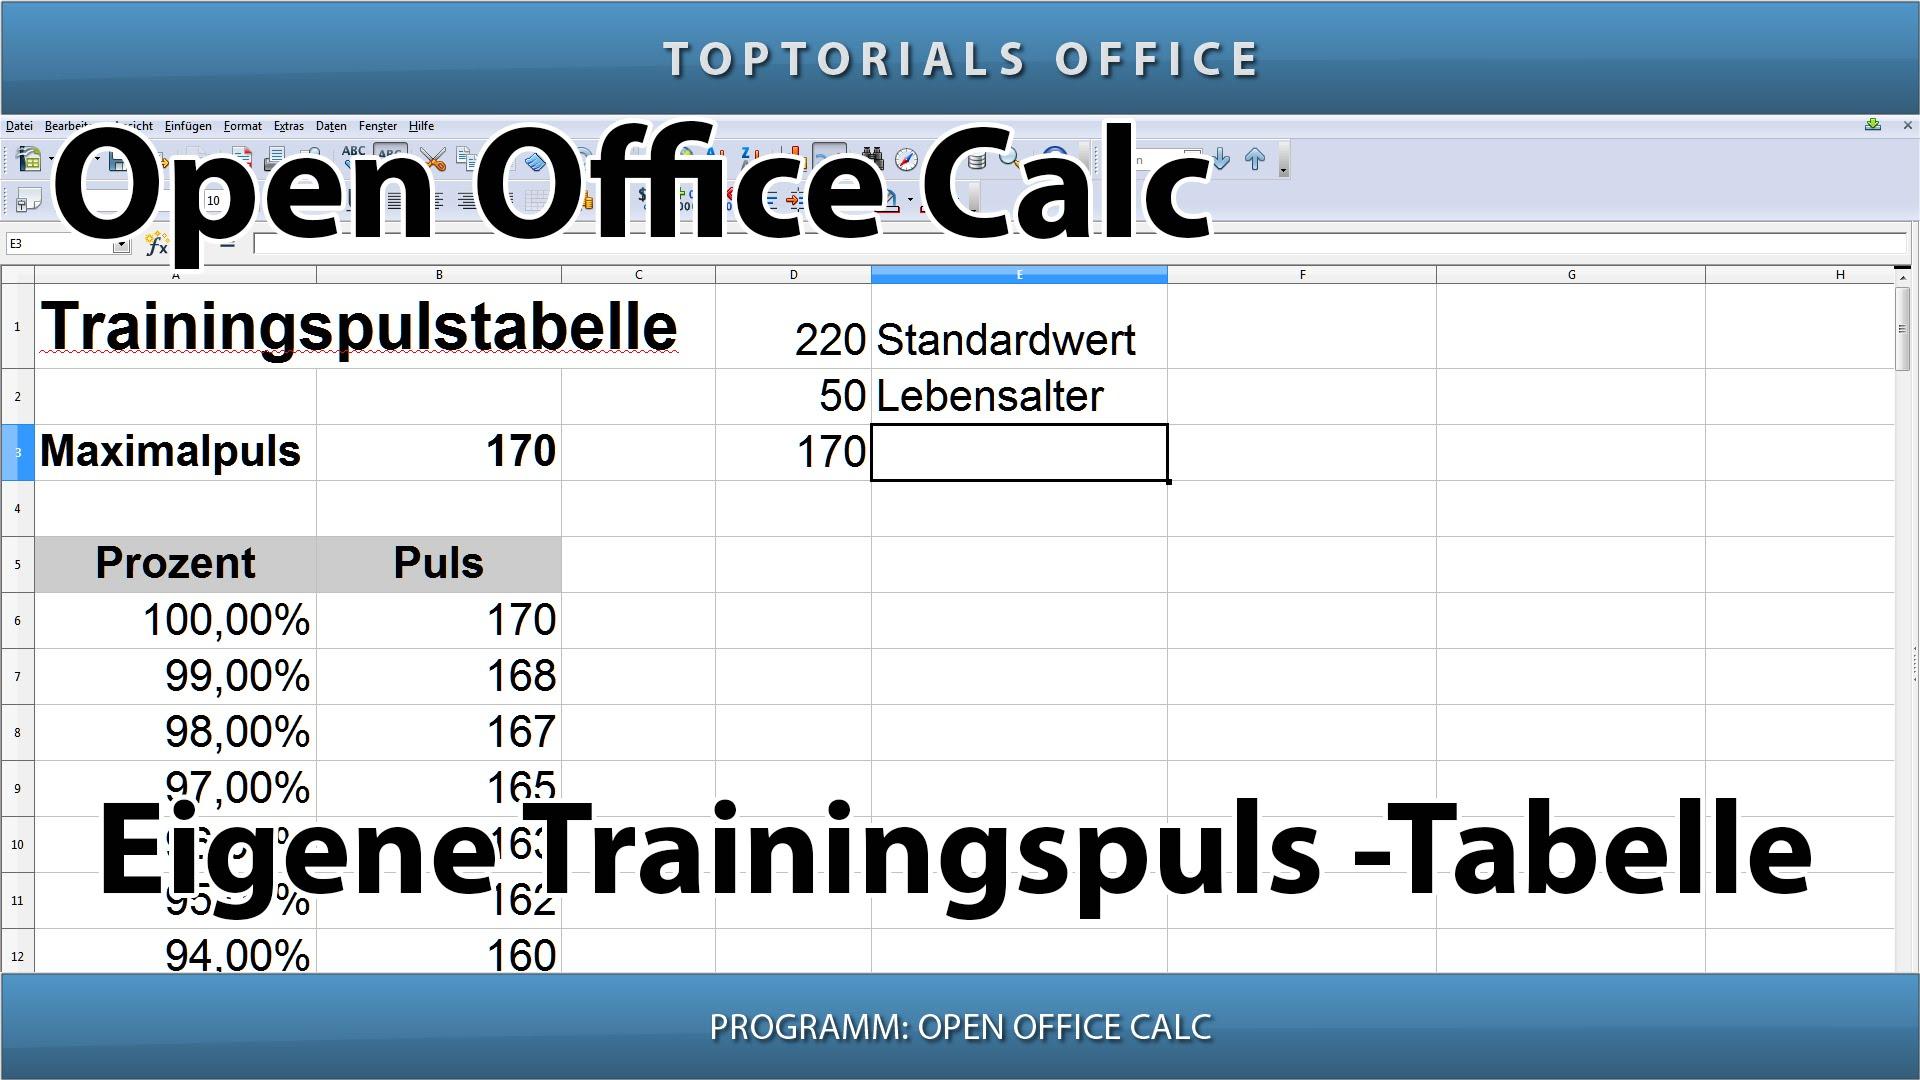 Eigene trainingspuls tabelle open office calc toptorials for Tabelle open office